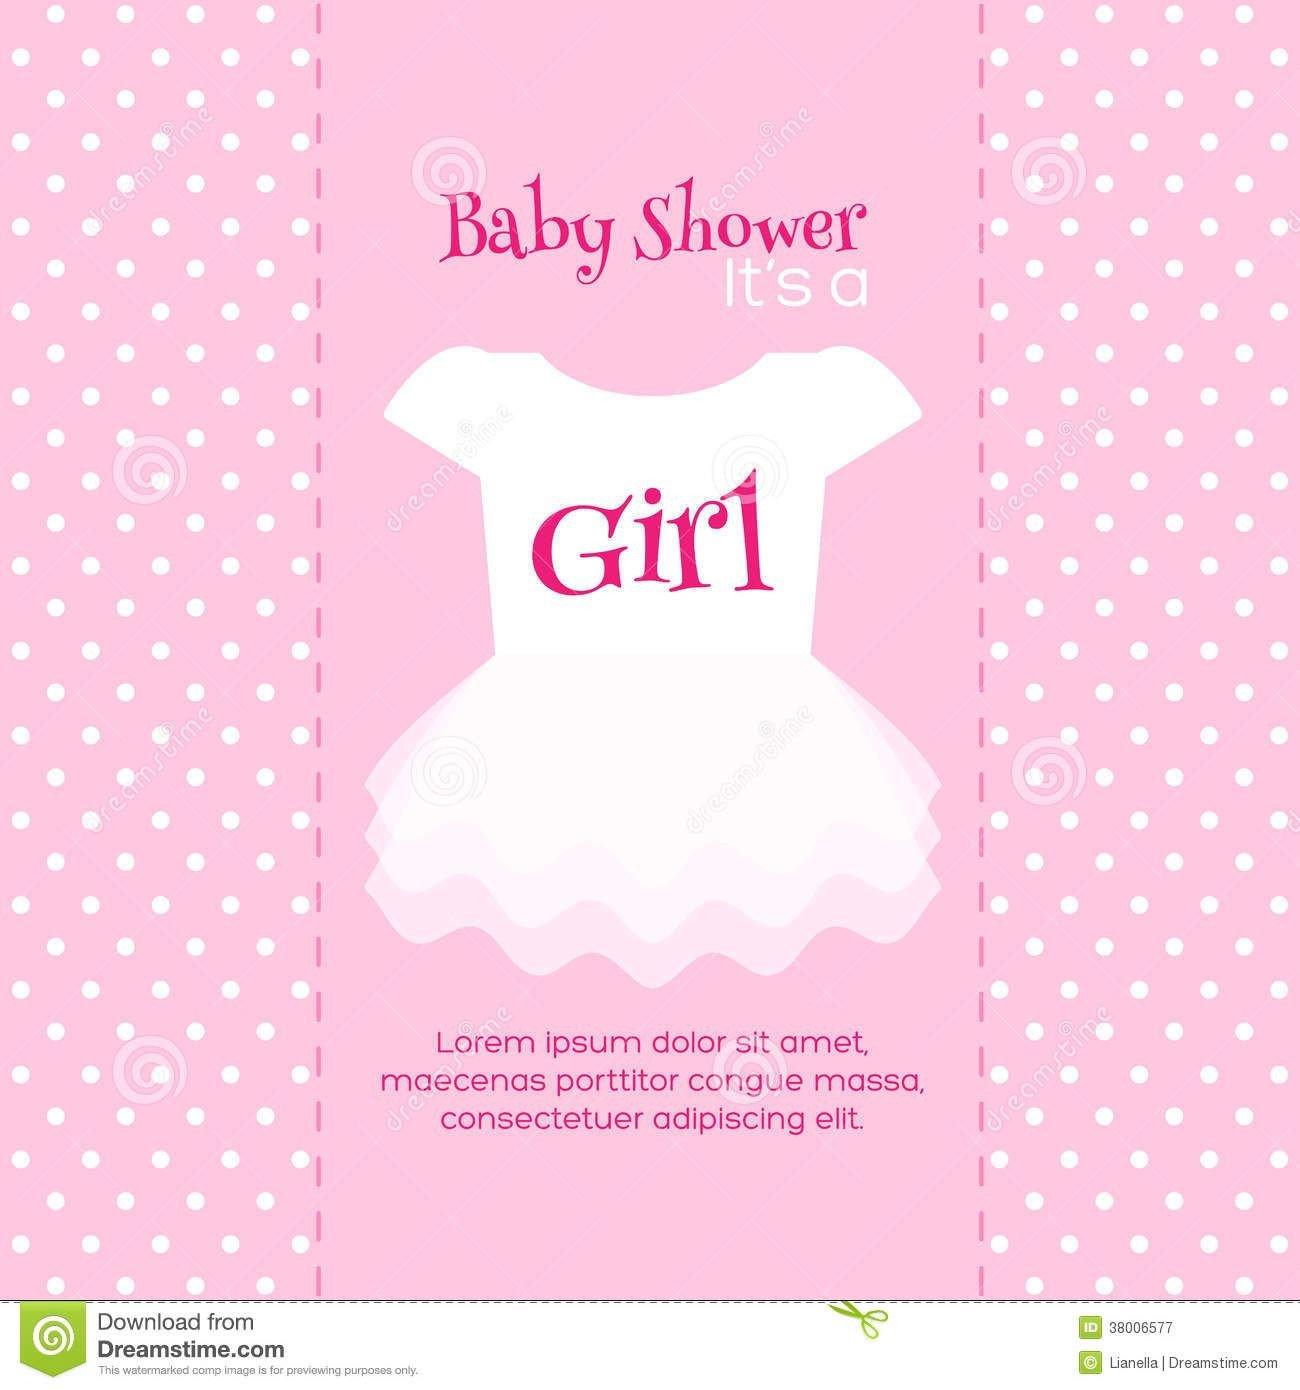 Baby Shower Invitation Template Design Free Printable Baby Shower Invitations for Girls